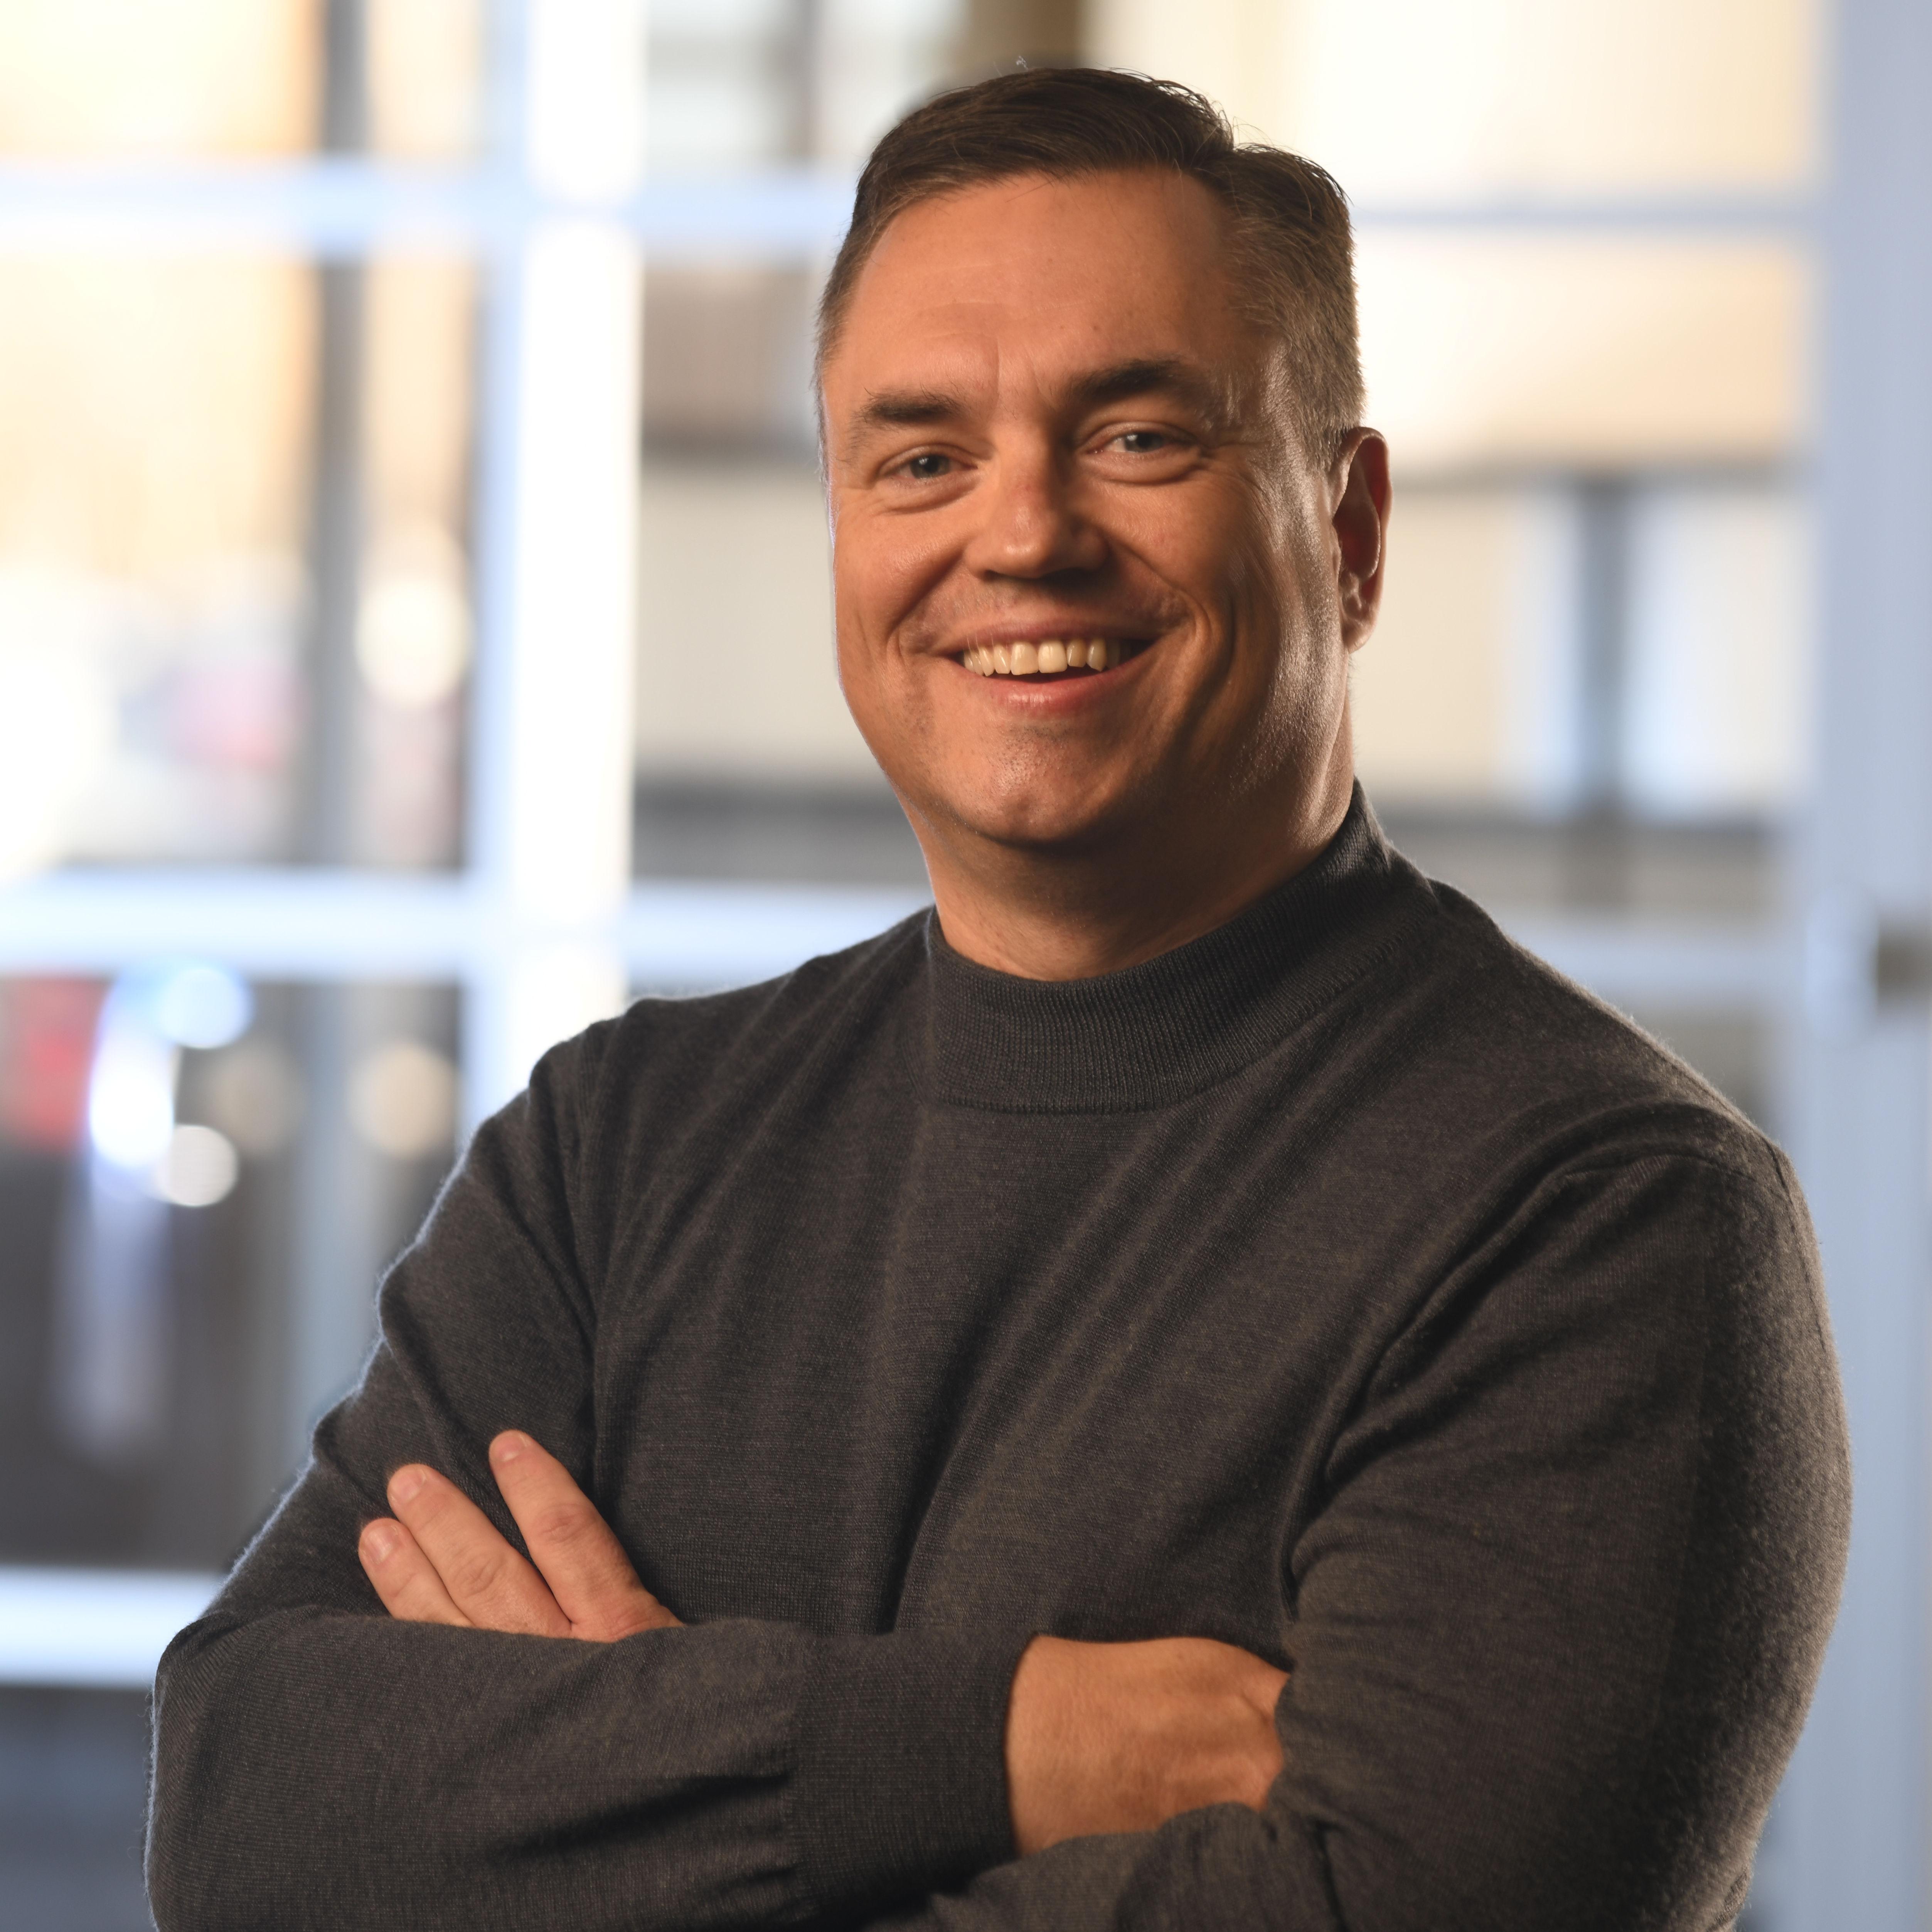 Frank Schirrmeister, Cadence Design Systems, DE